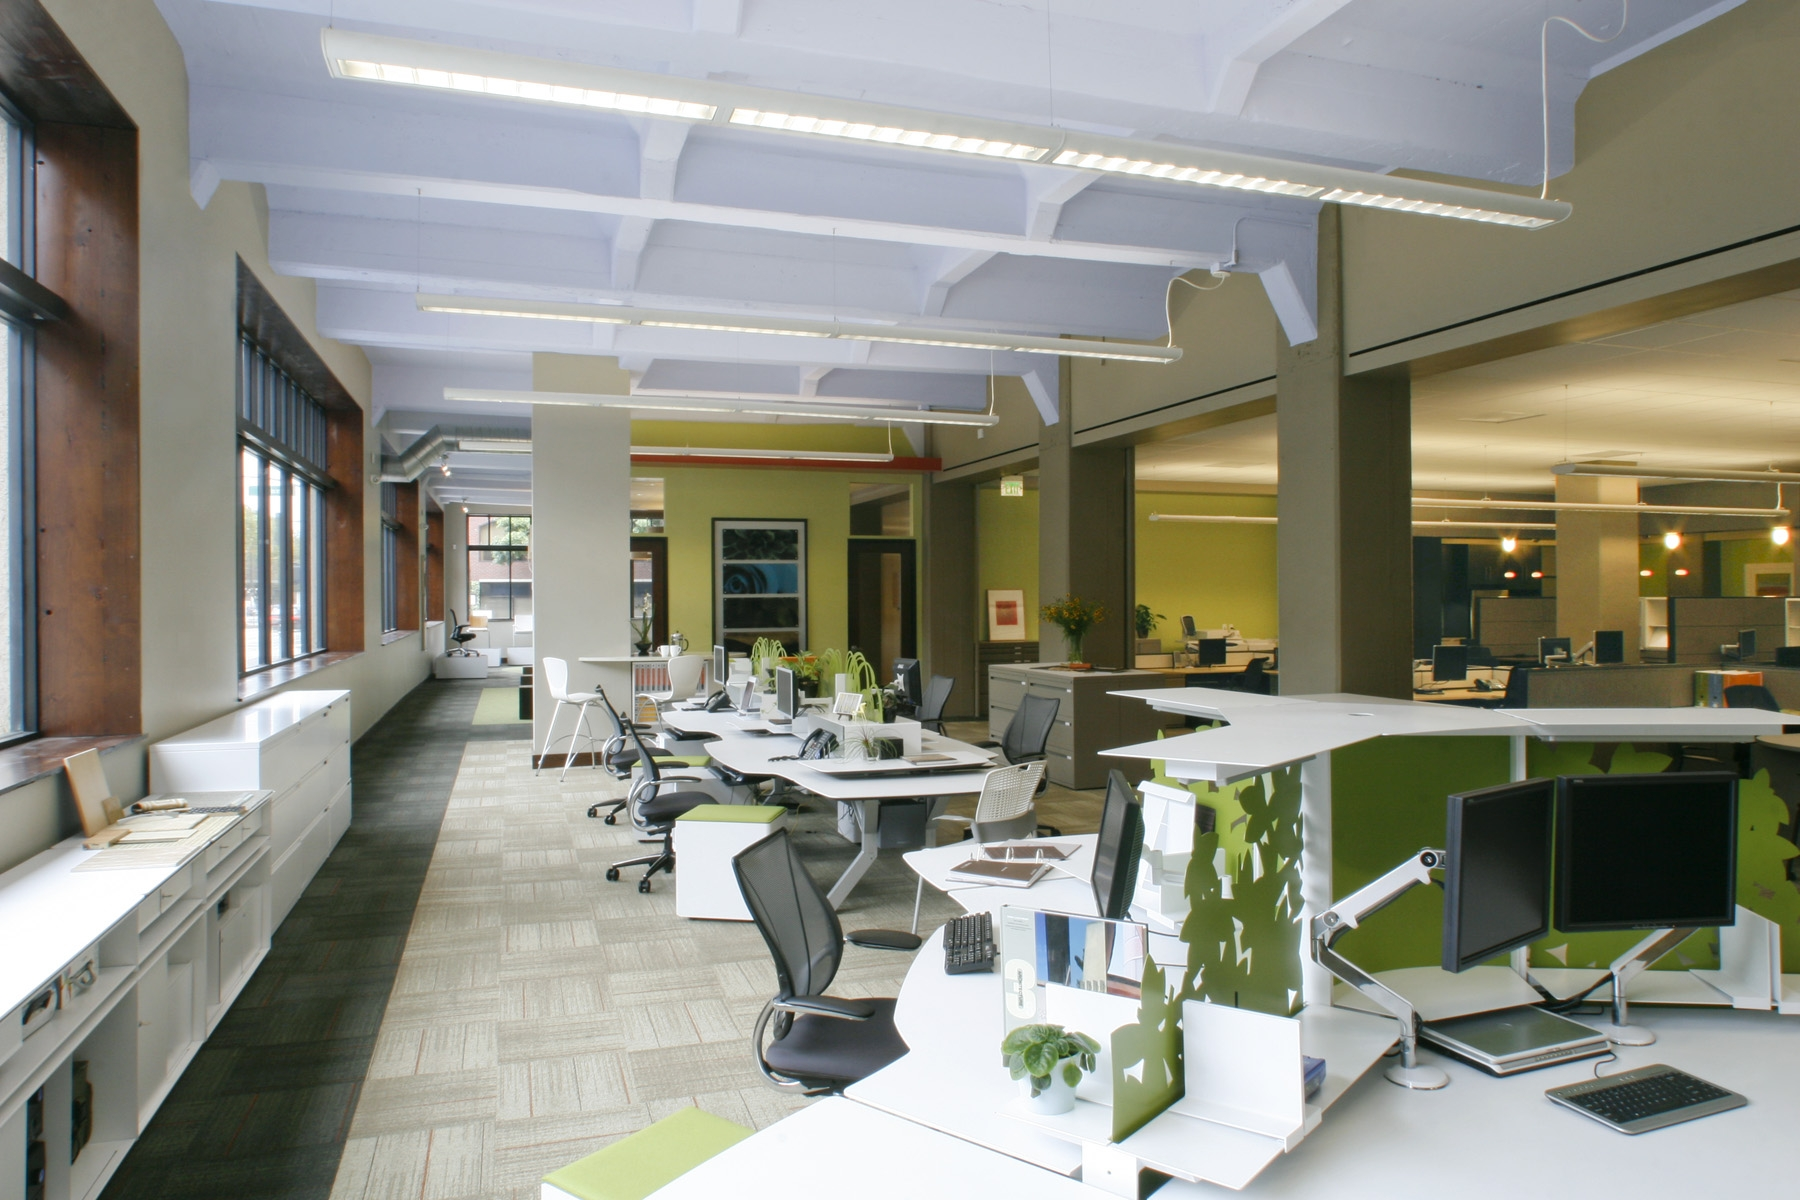 kurumsal-ofis--isletme-mobilya-secimi